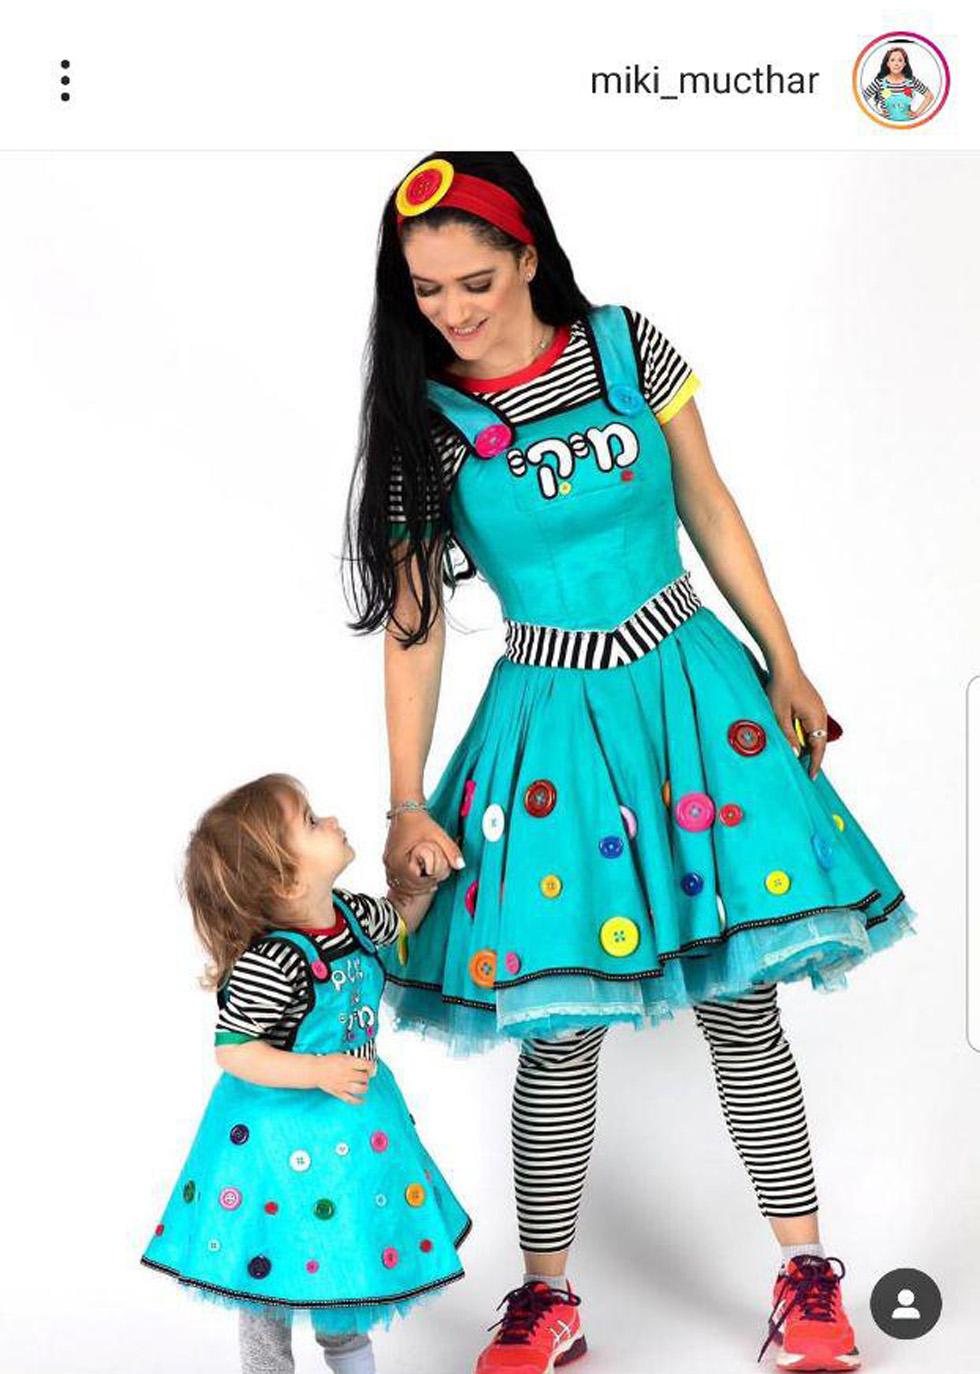 Мики Мухтар с дочкой. Фото: инстаграм